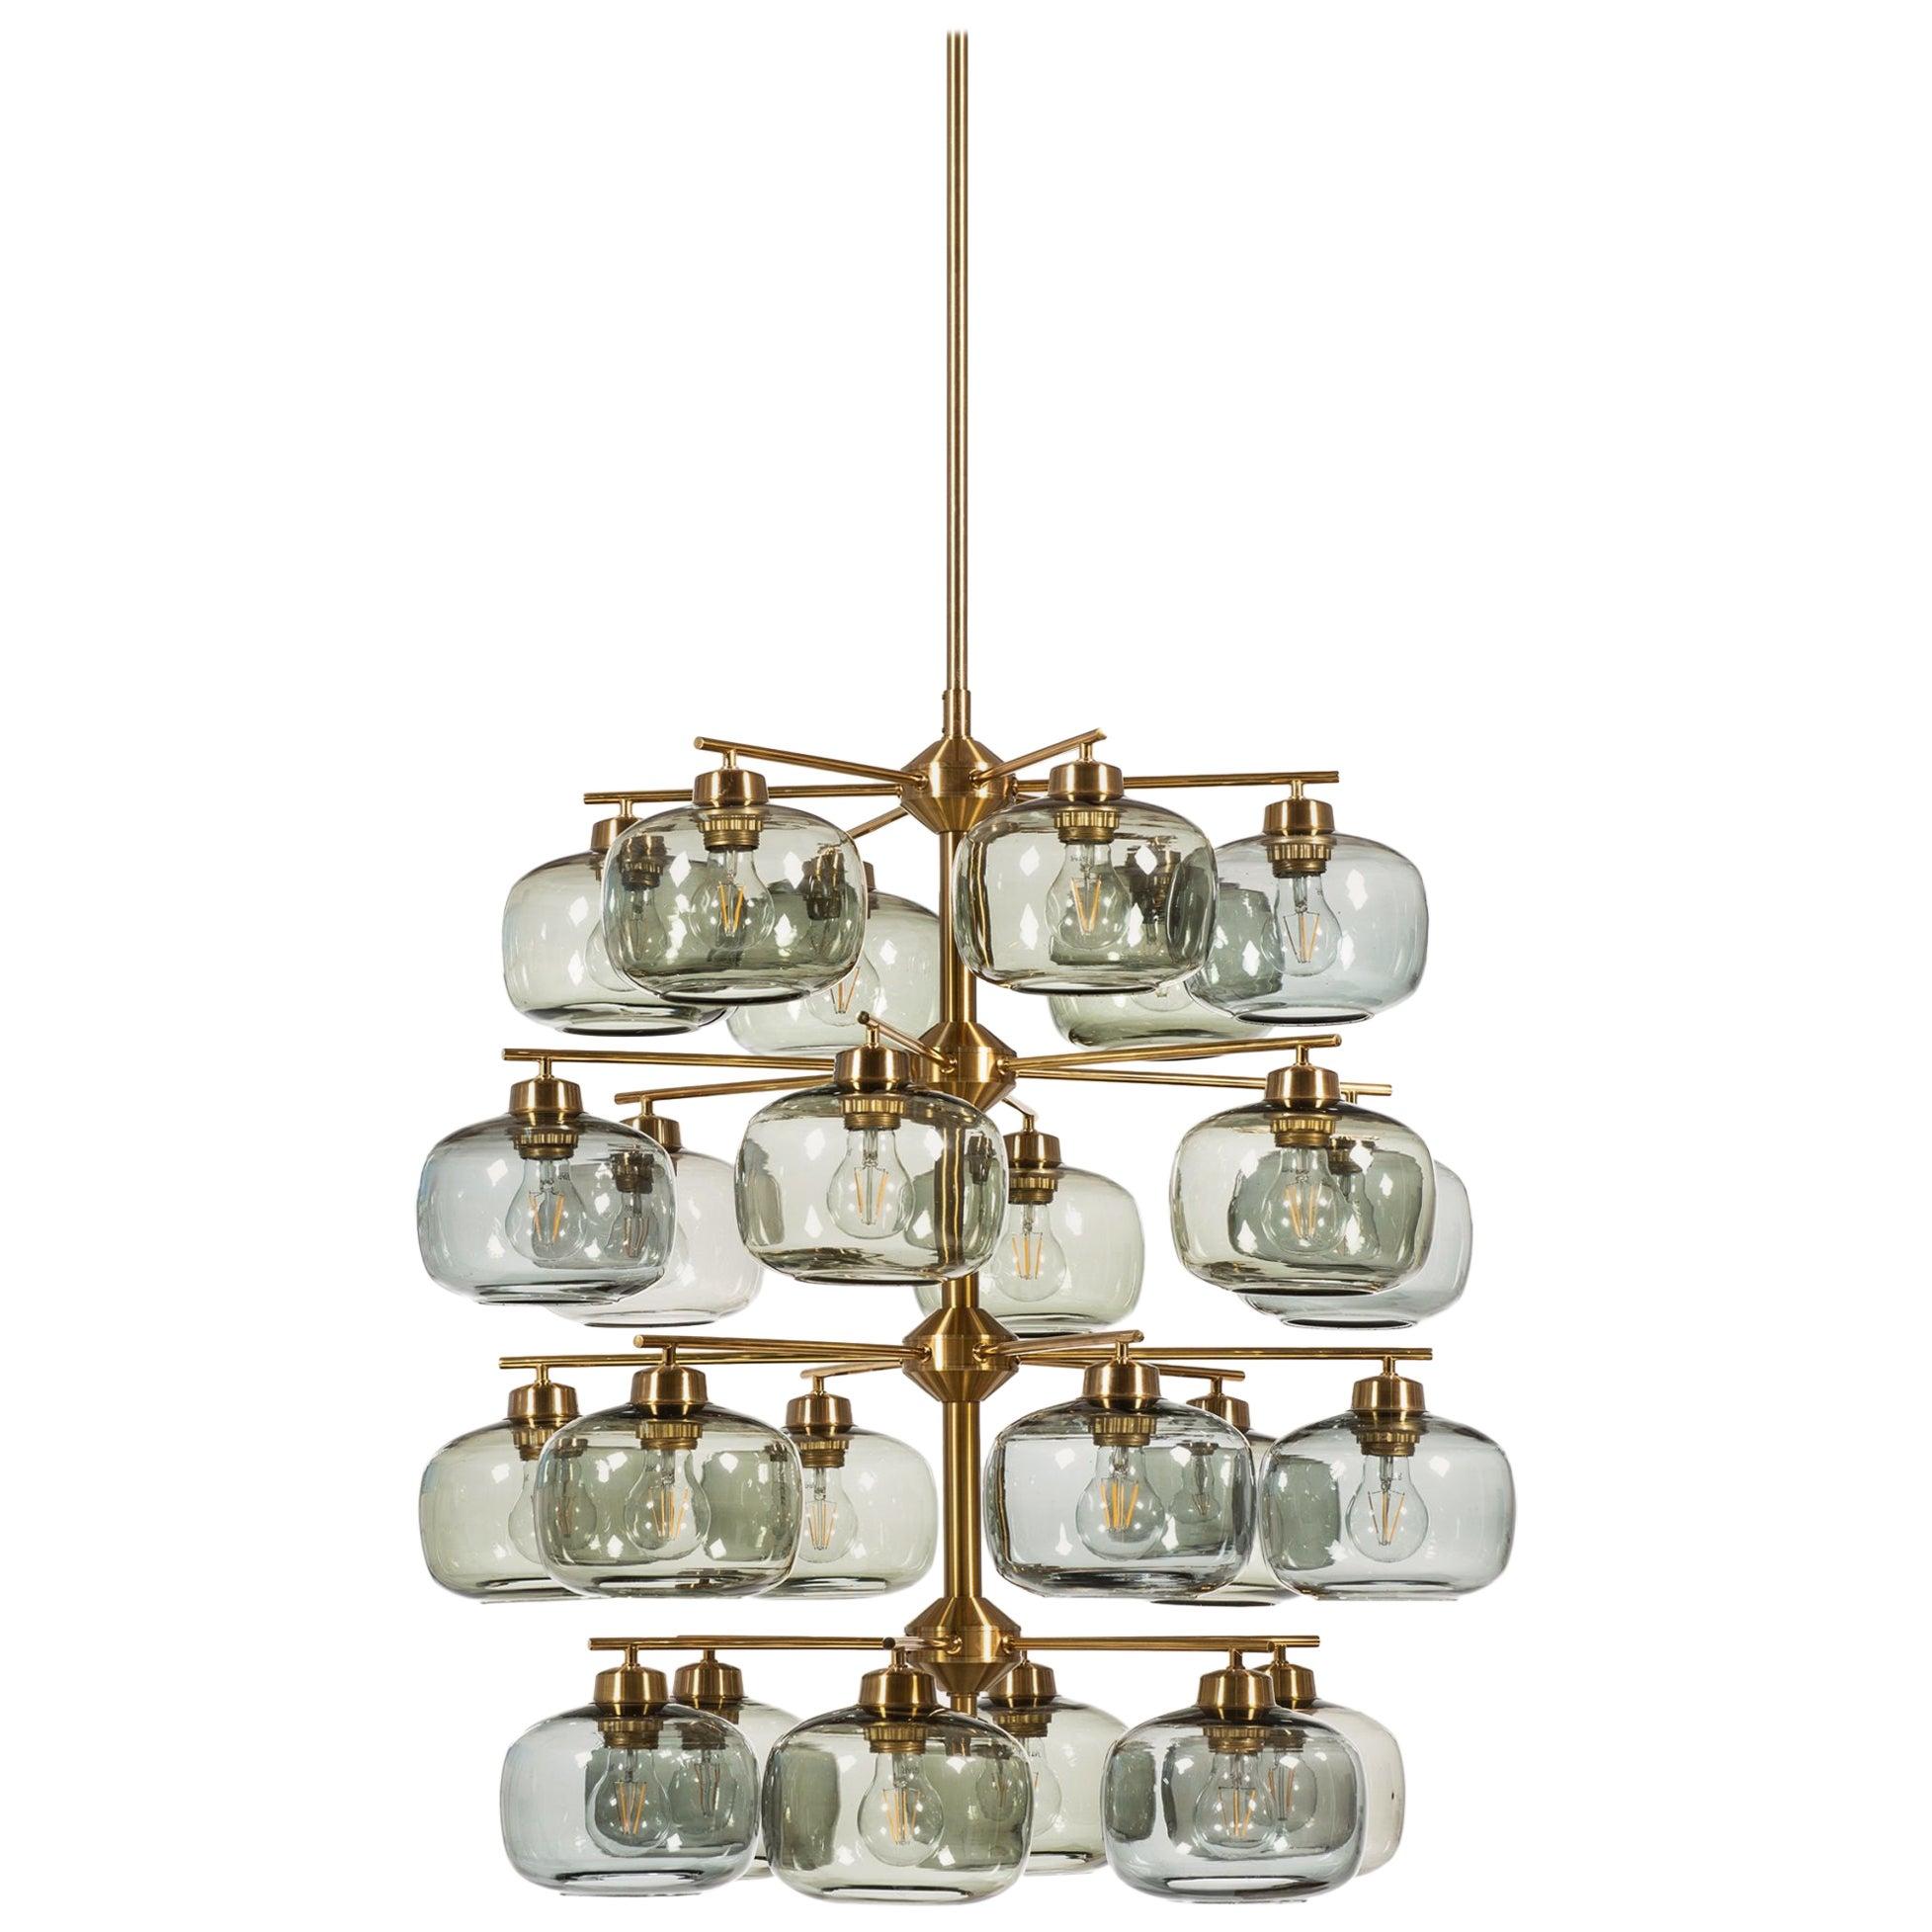 Holger Johansson Ceiling Lamp Produced by Westal in Sweden